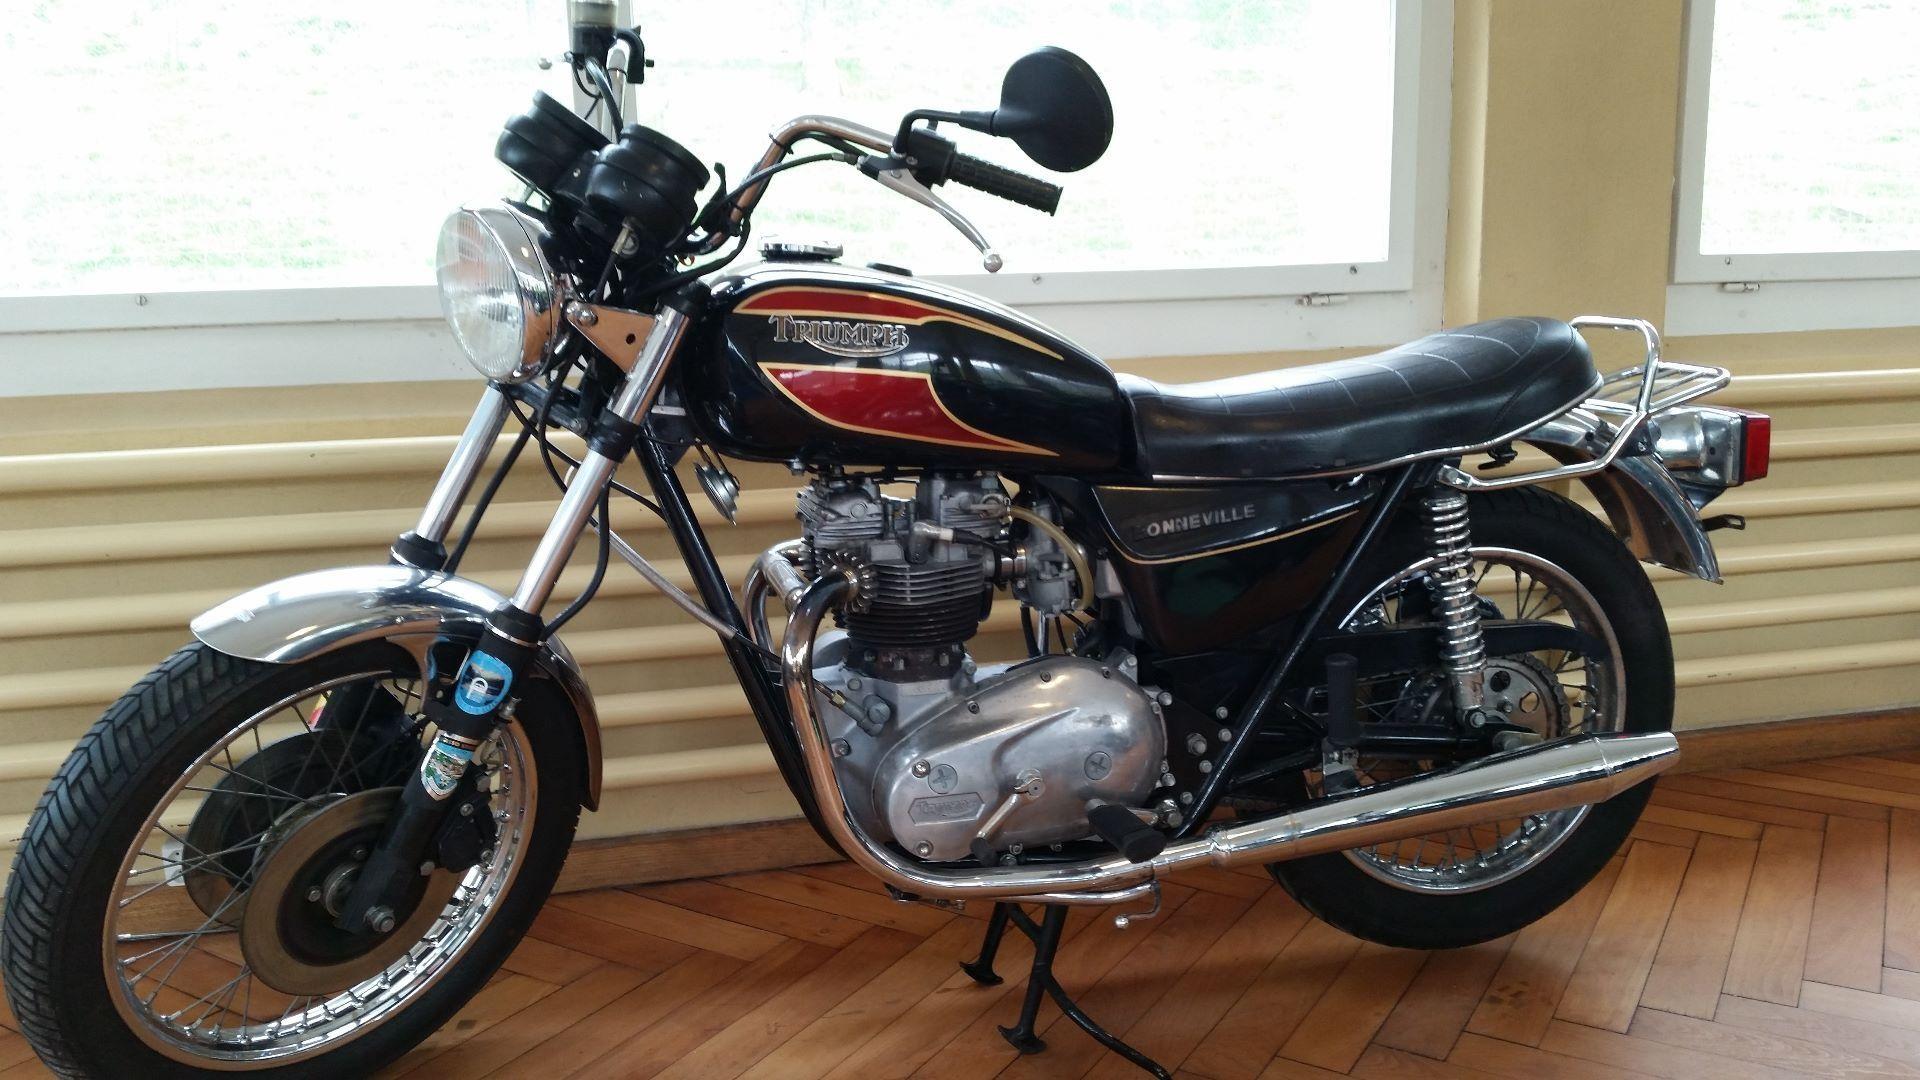 motorrad occasion kaufen triumph t 140 harris bonneville motorrad technik wyss holderbank. Black Bedroom Furniture Sets. Home Design Ideas